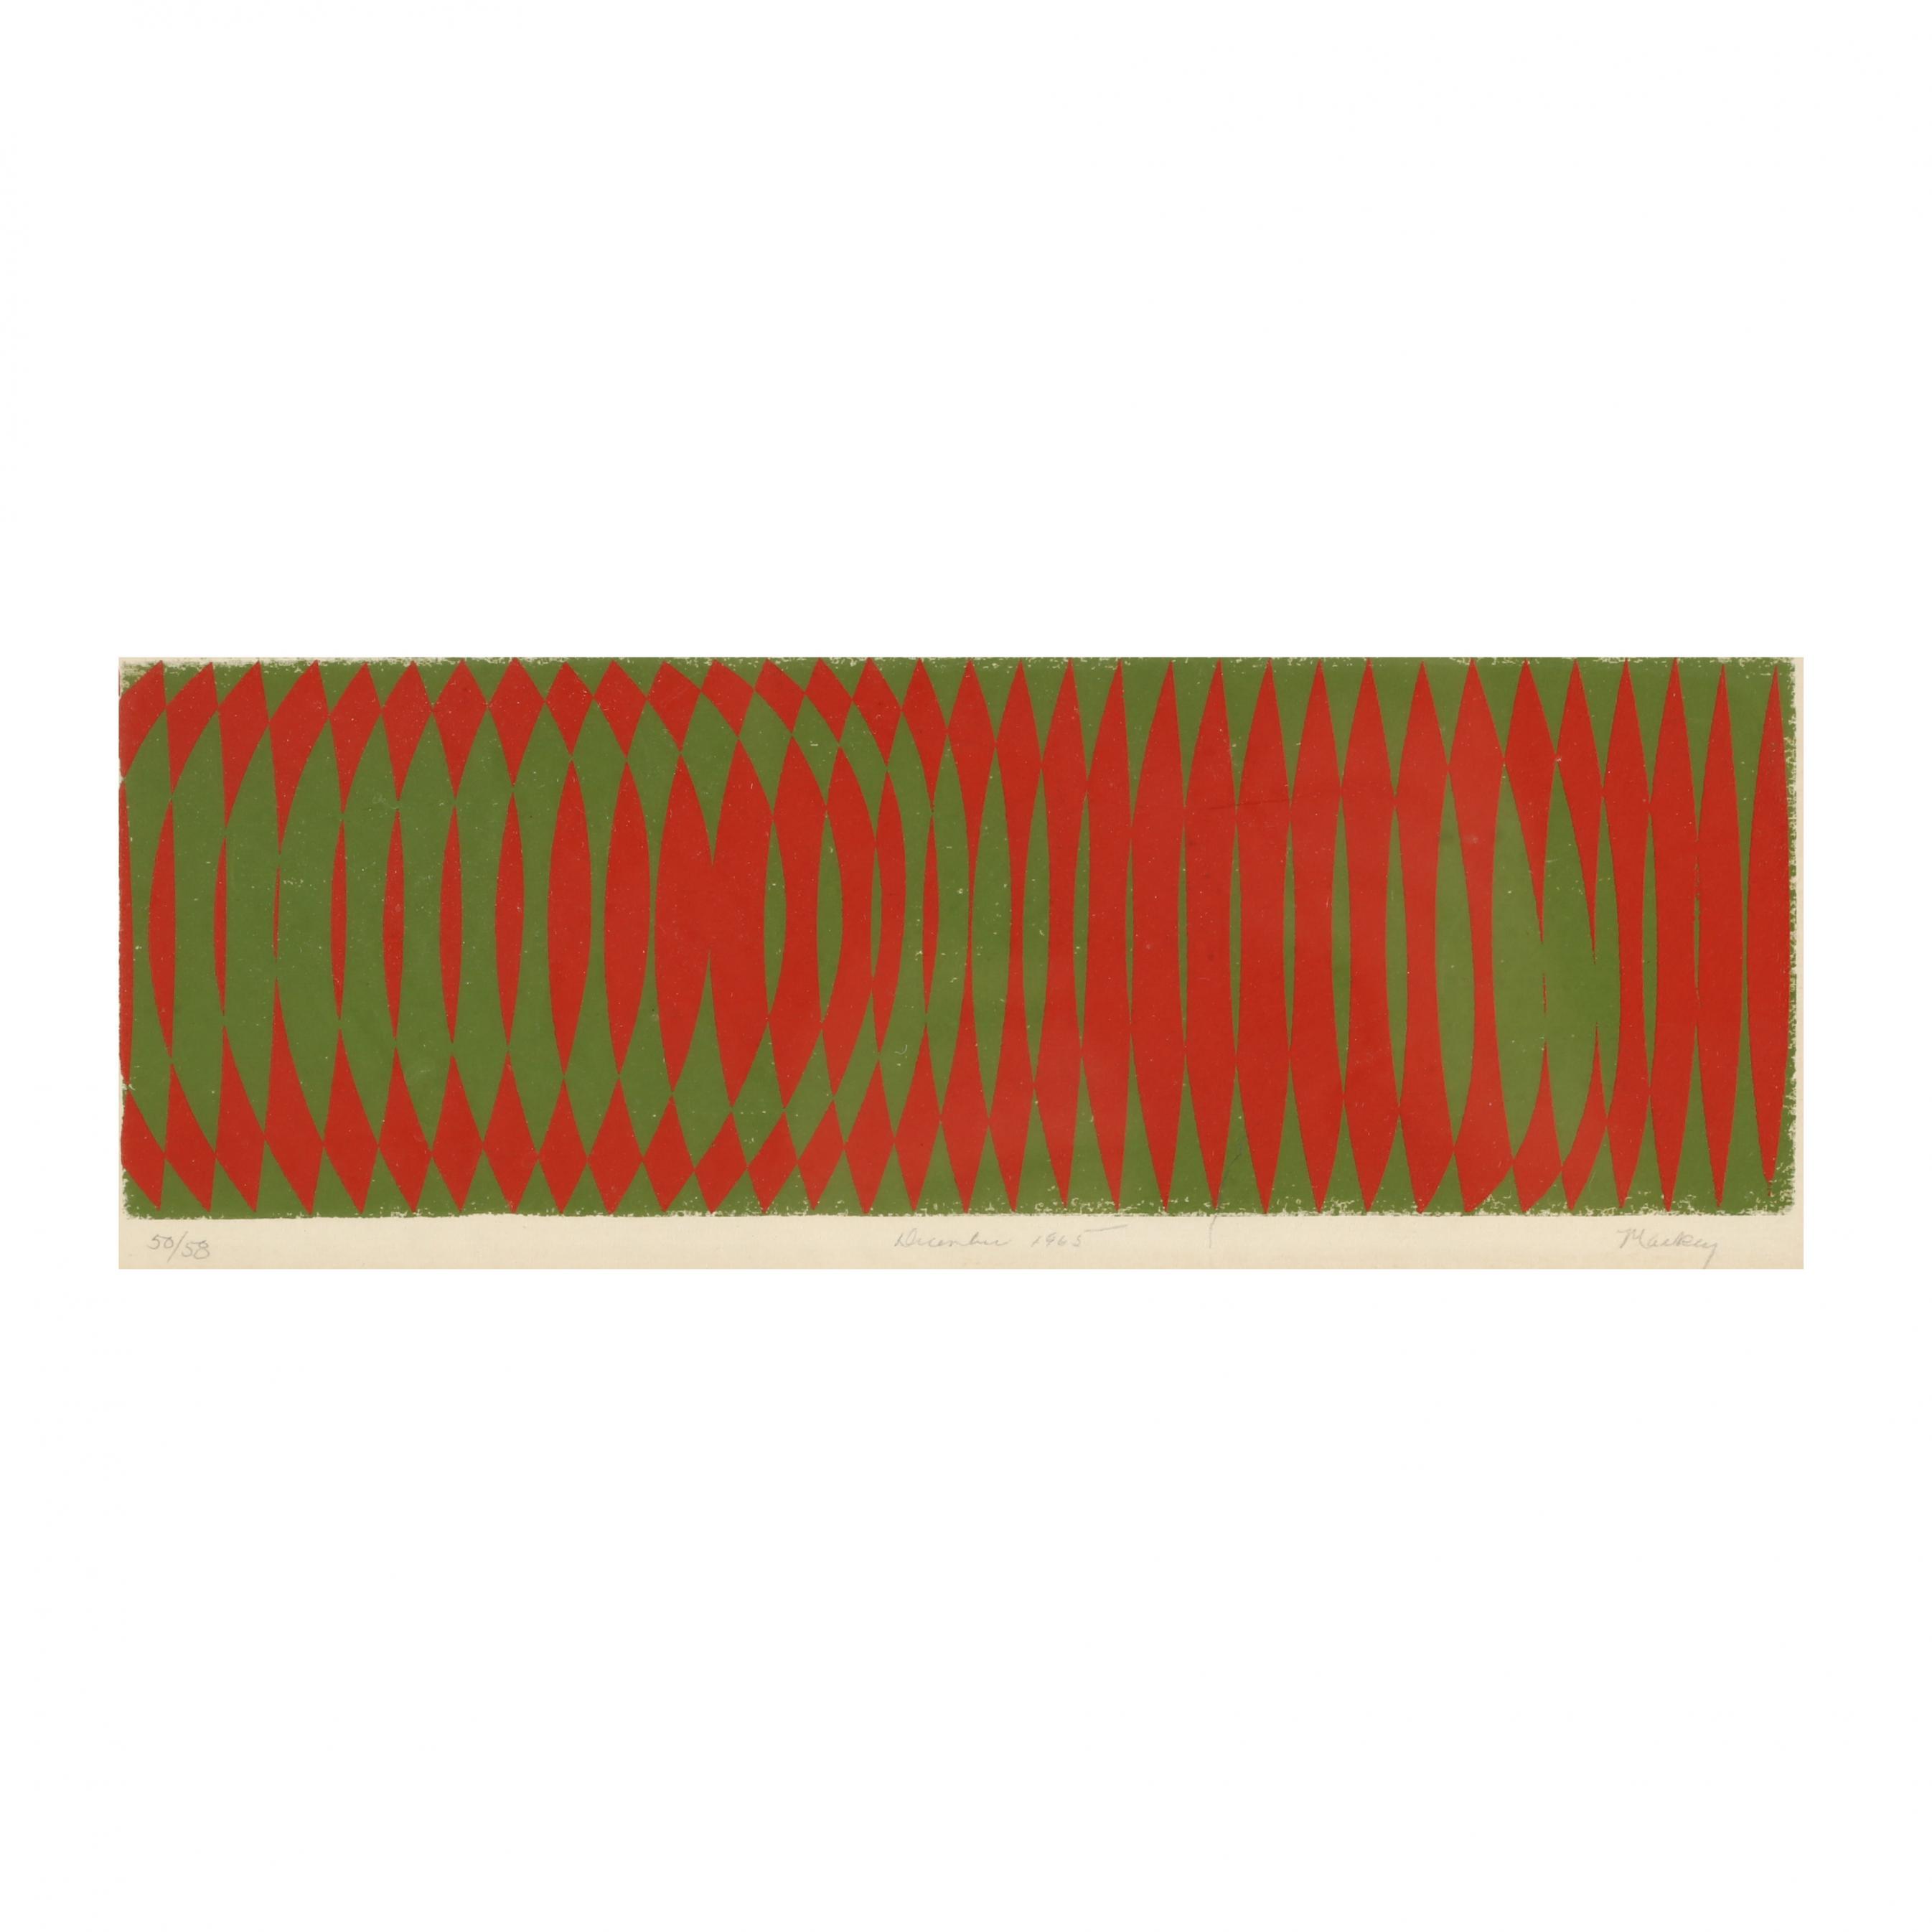 mcdonald-mackey-bane-nc-born-1928-framed-silkscreen-christmas-card-1965